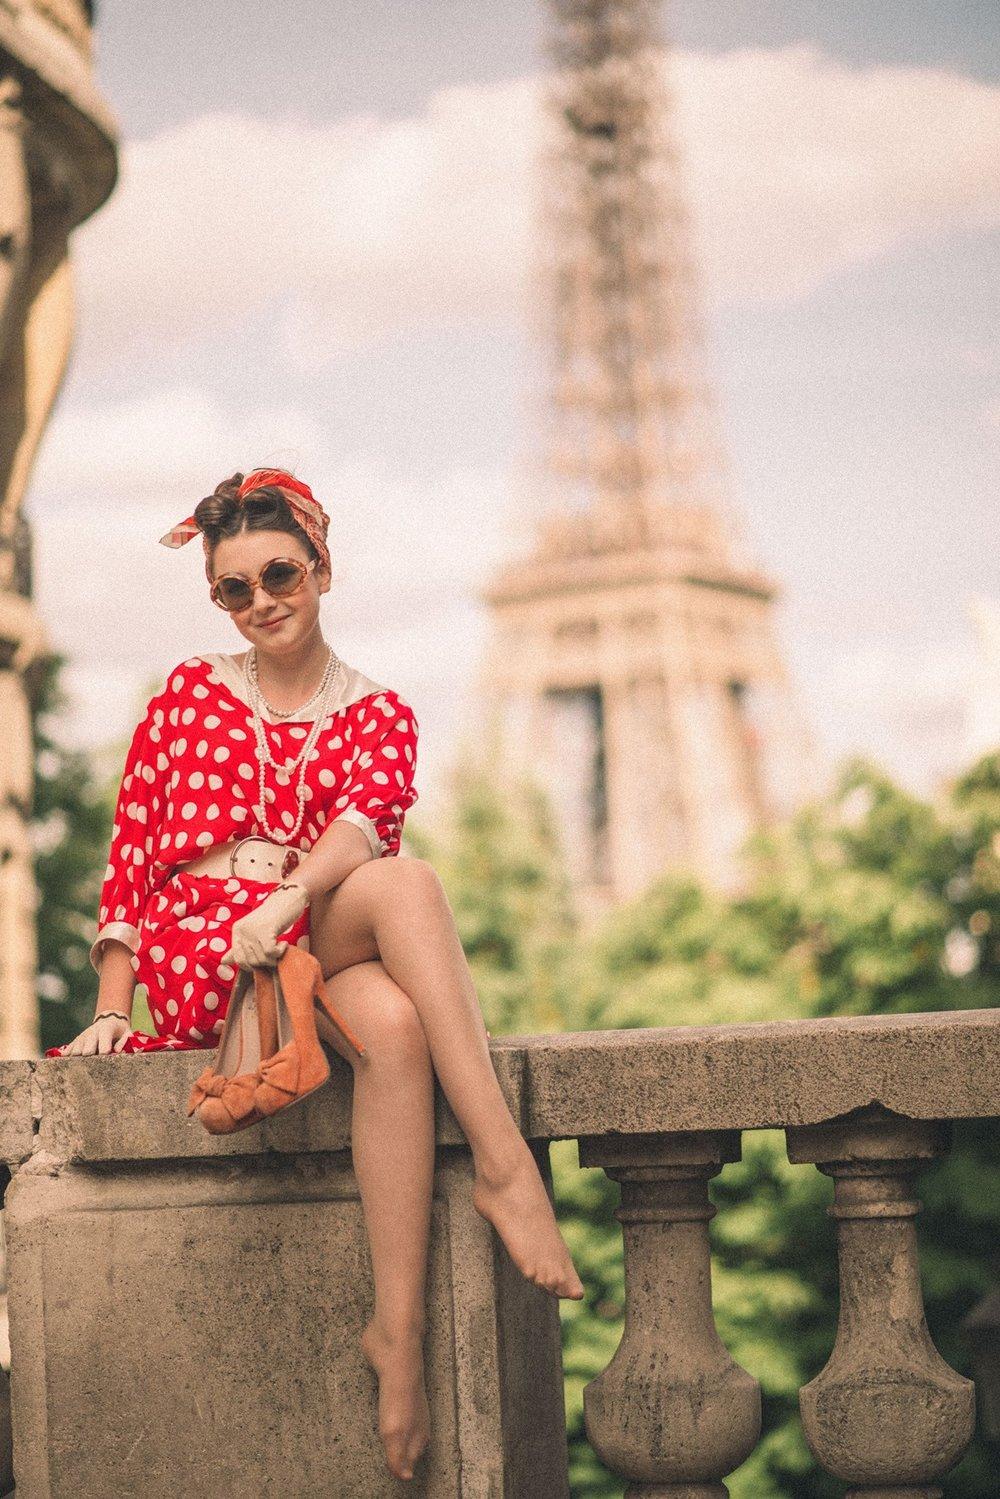 Sprazzi_Professional_Photography_Paris_Taehun23.jpg